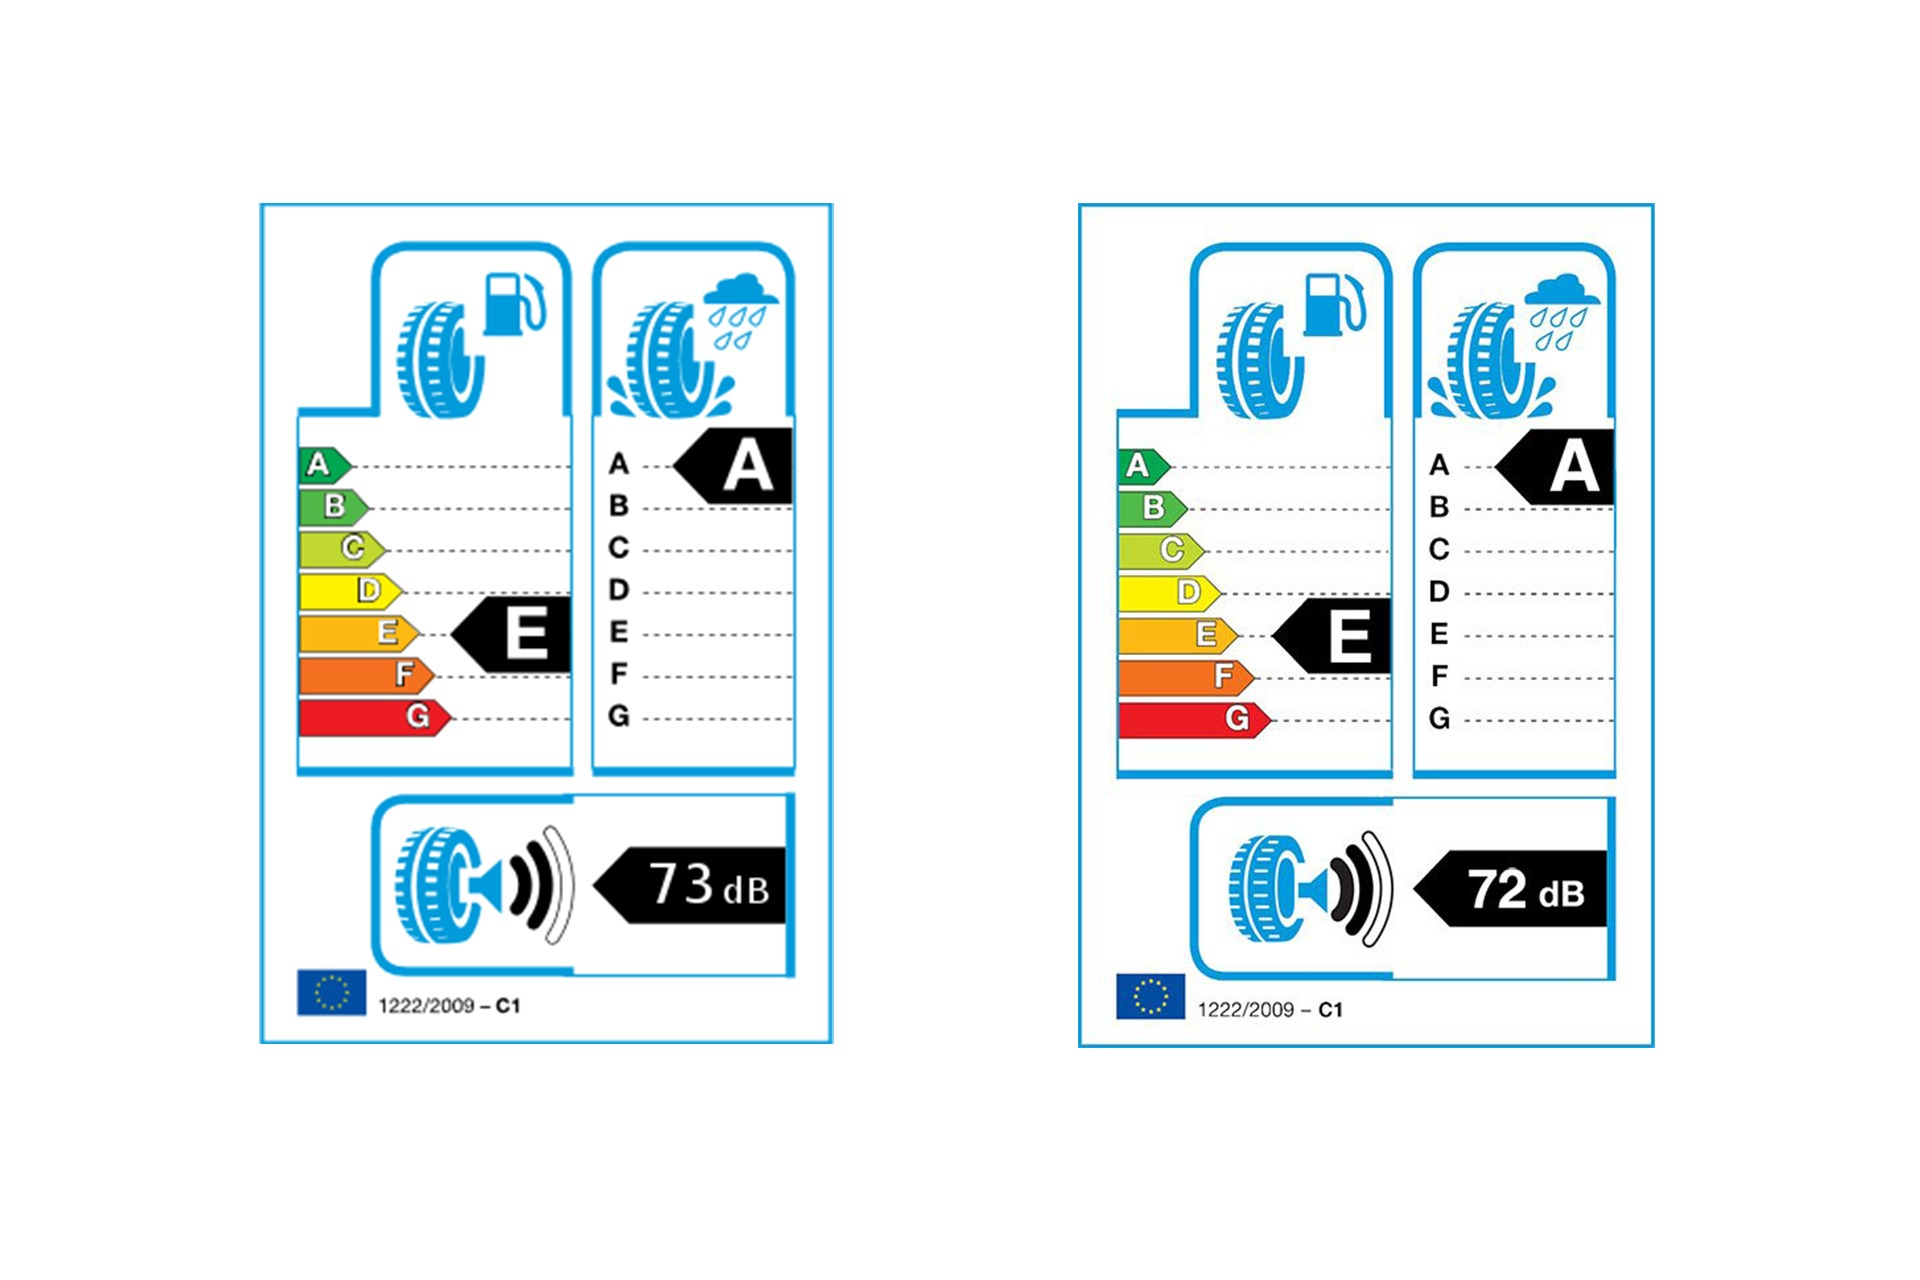 Foto: EU-Reifenlabel für Continental ContiSportContact 5P 265/35 ZR21 101Y und Continental ContiSportContact 5P 245/35 ZR21 96Y